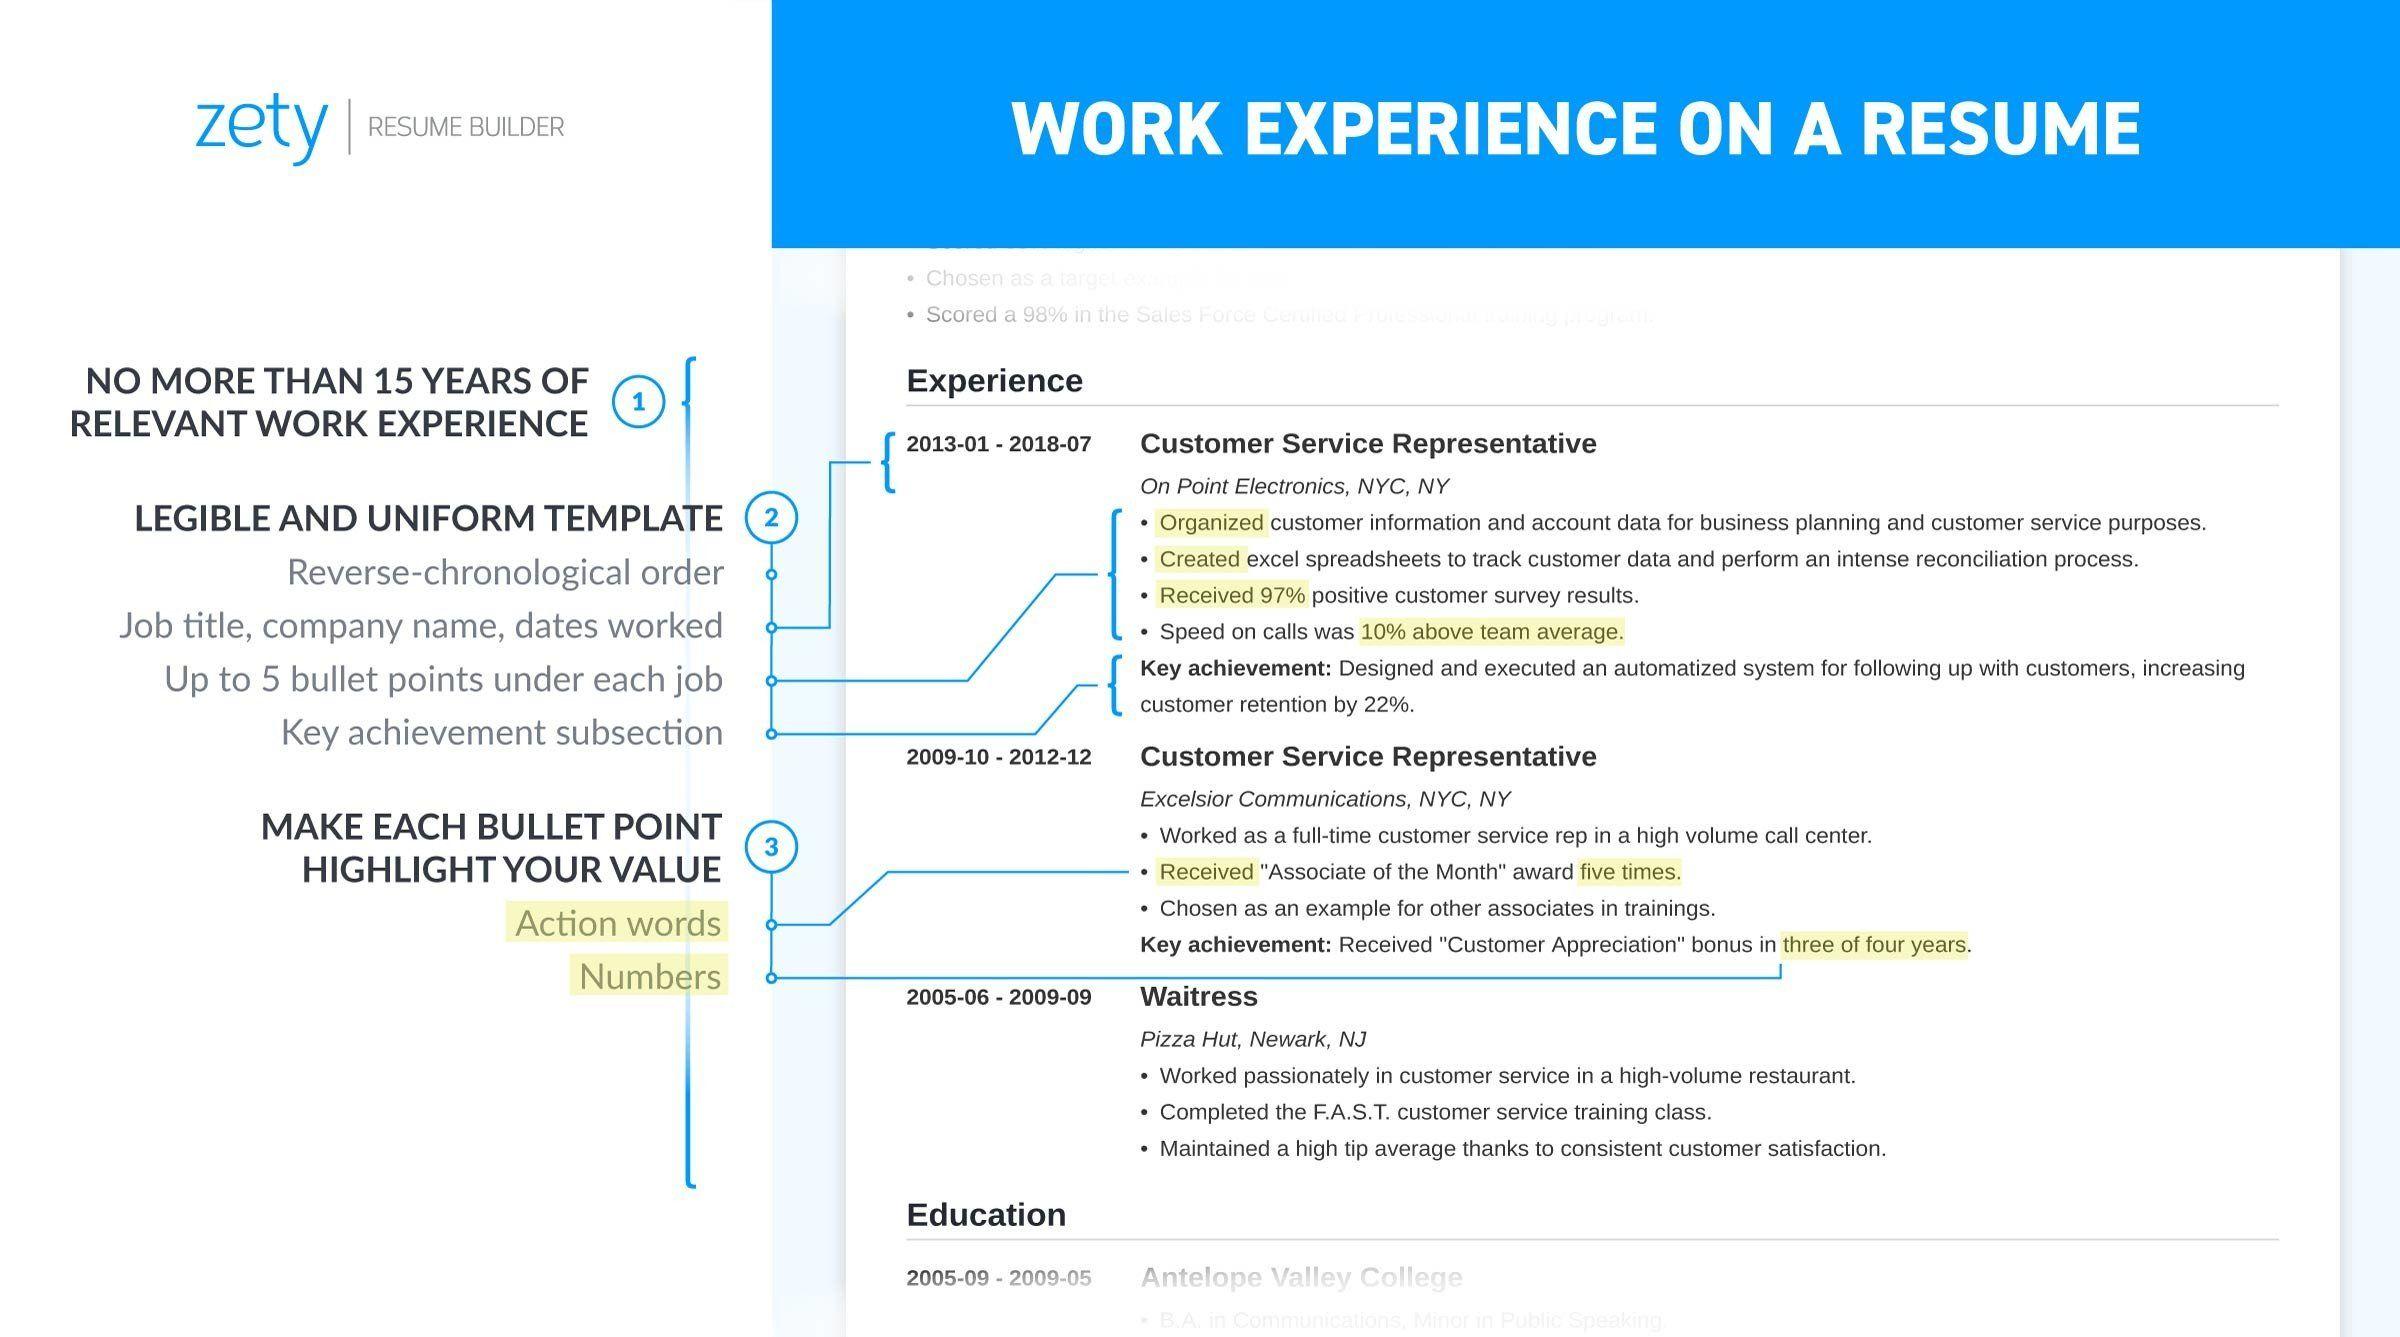 Work Experience on a Resume Job Description Bullet Points